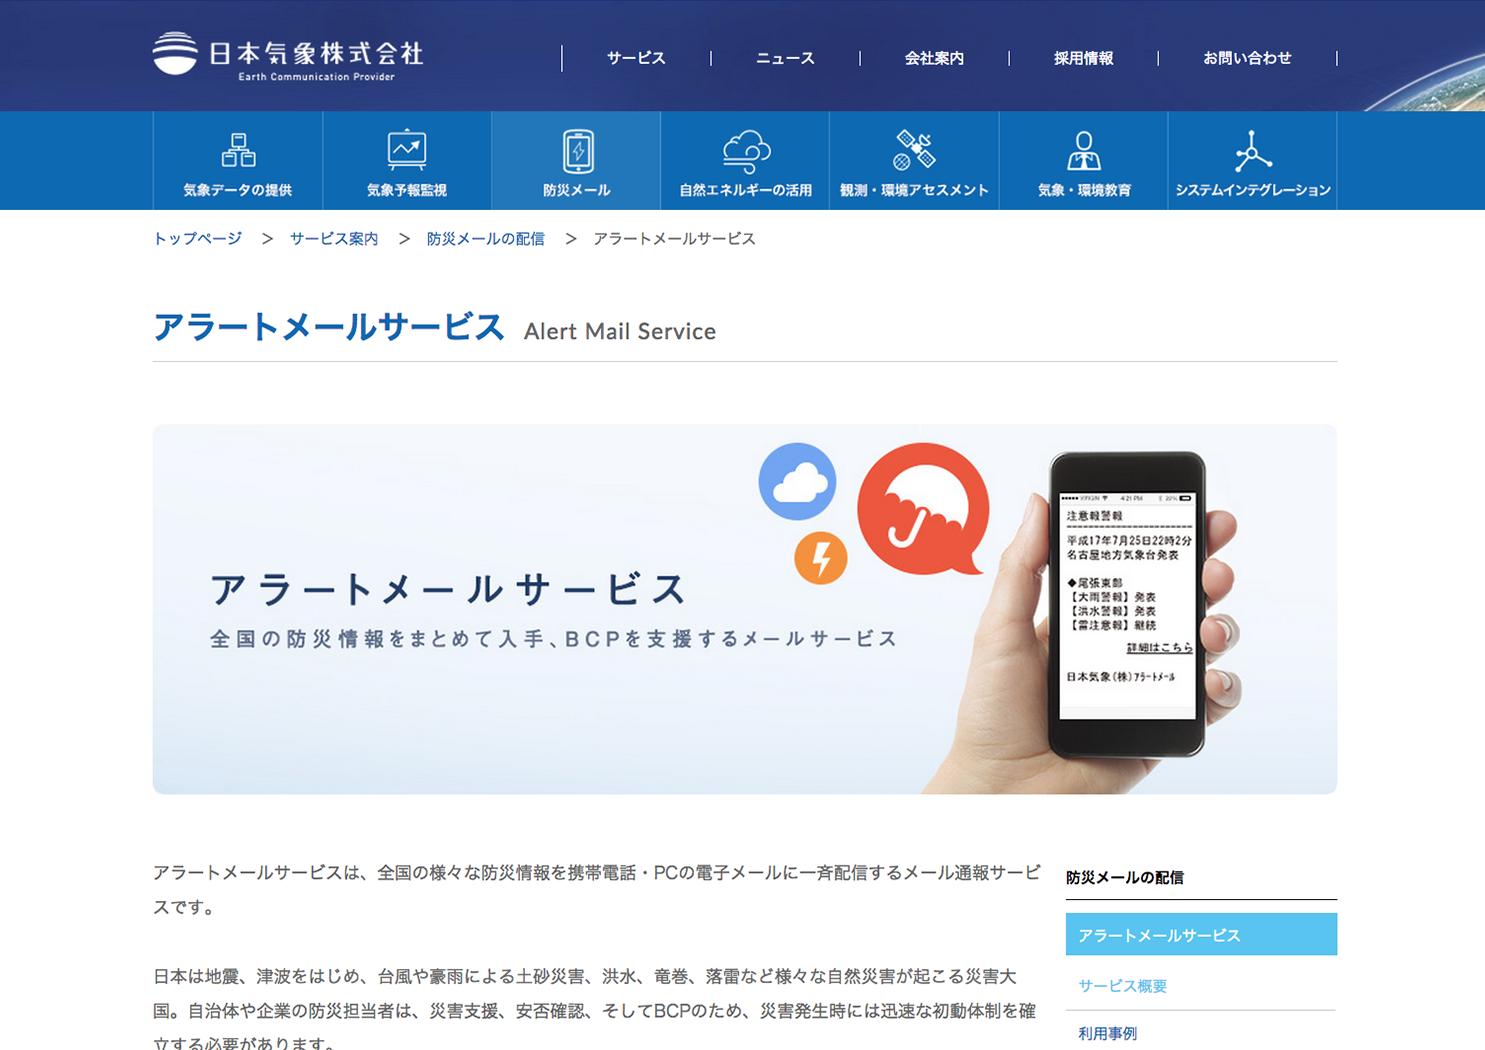 Nihonkisho  Official Website 2015